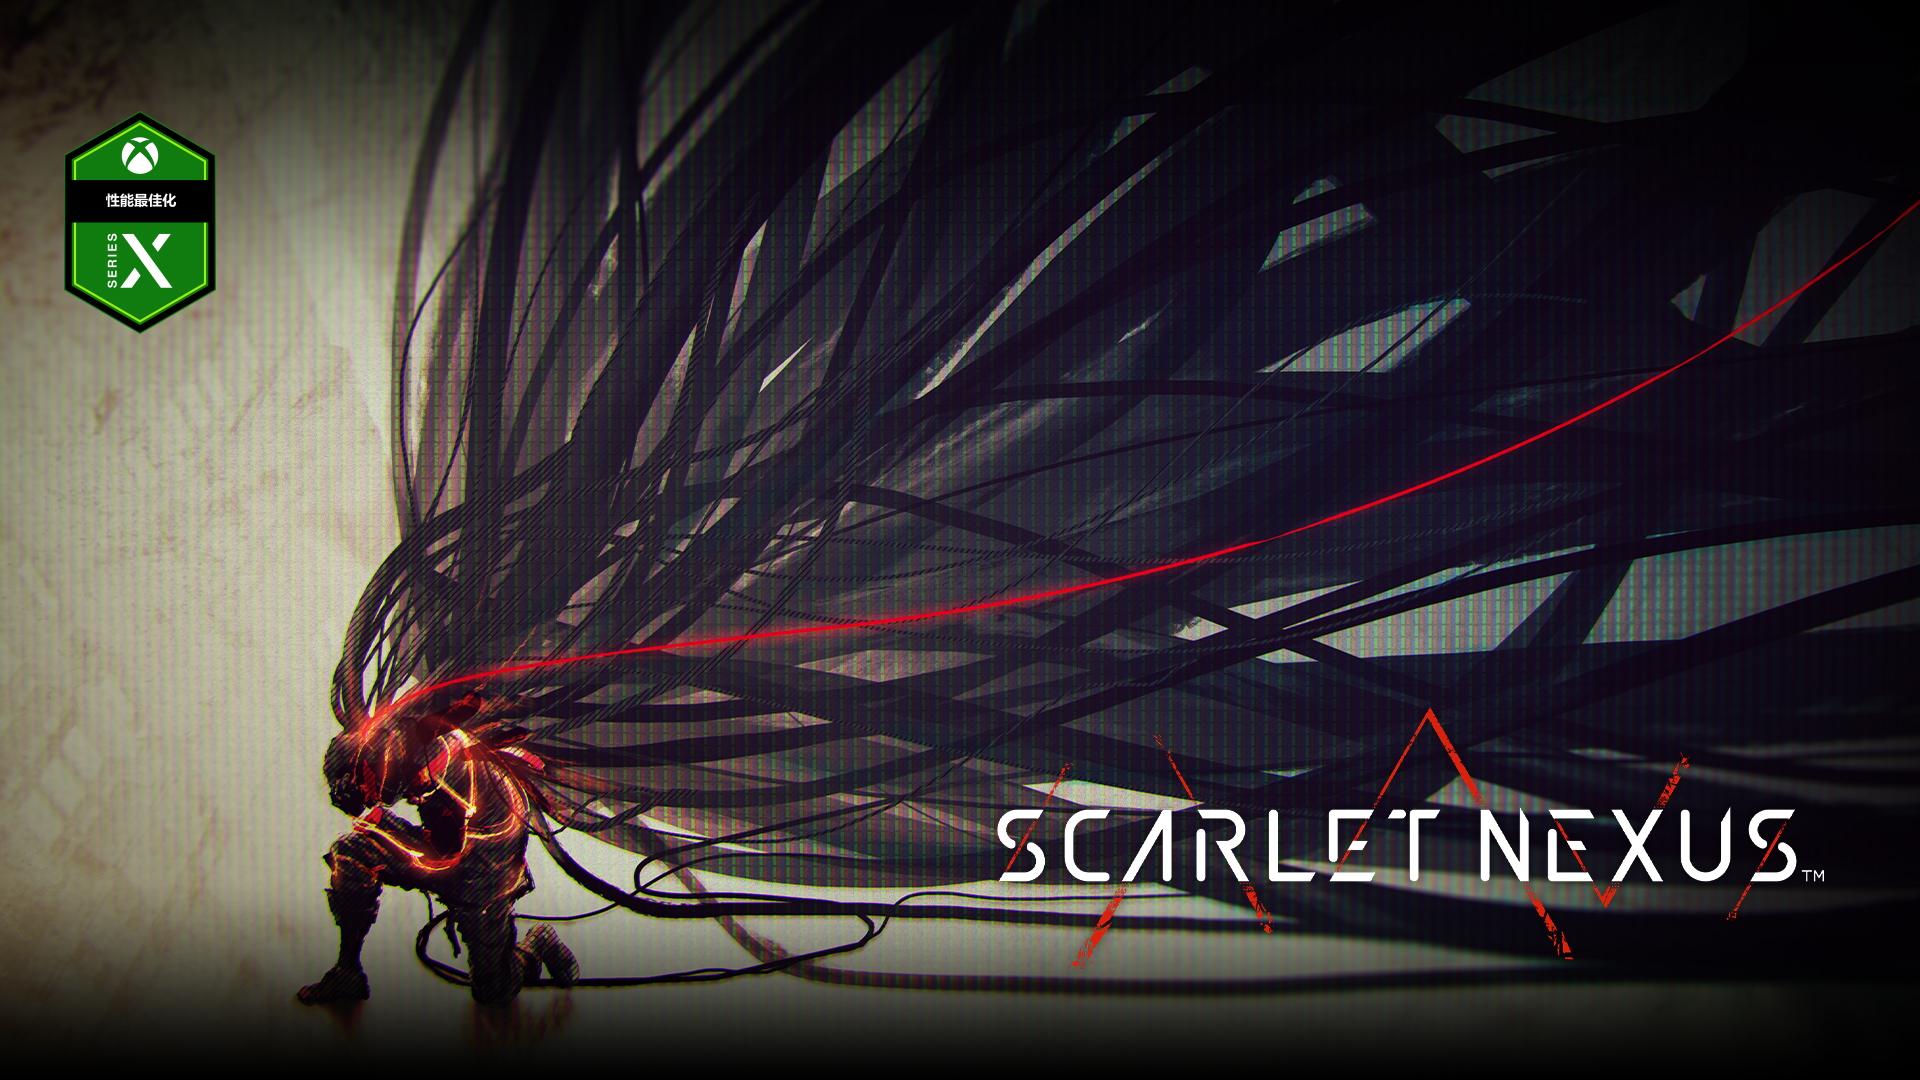 Scarlet Nexus,Xbox Series X 性能最佳化,有個男人跪著,大量像頭髮般的線從他身上流出